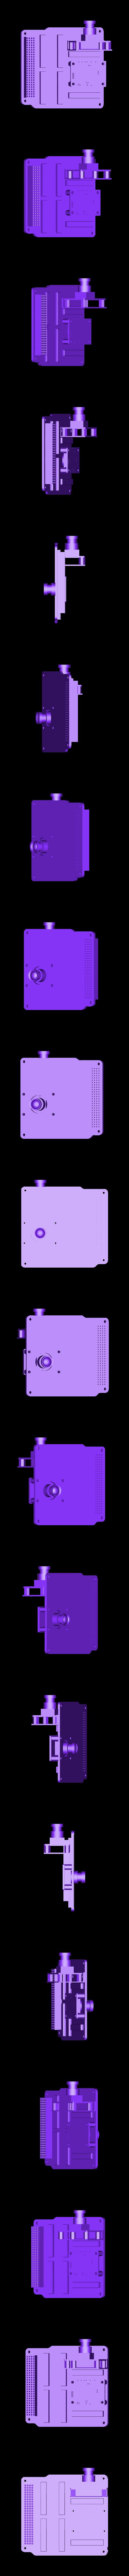 Payload.stl Download free STL file ArduSat • 3D printing template, Loustic3D888